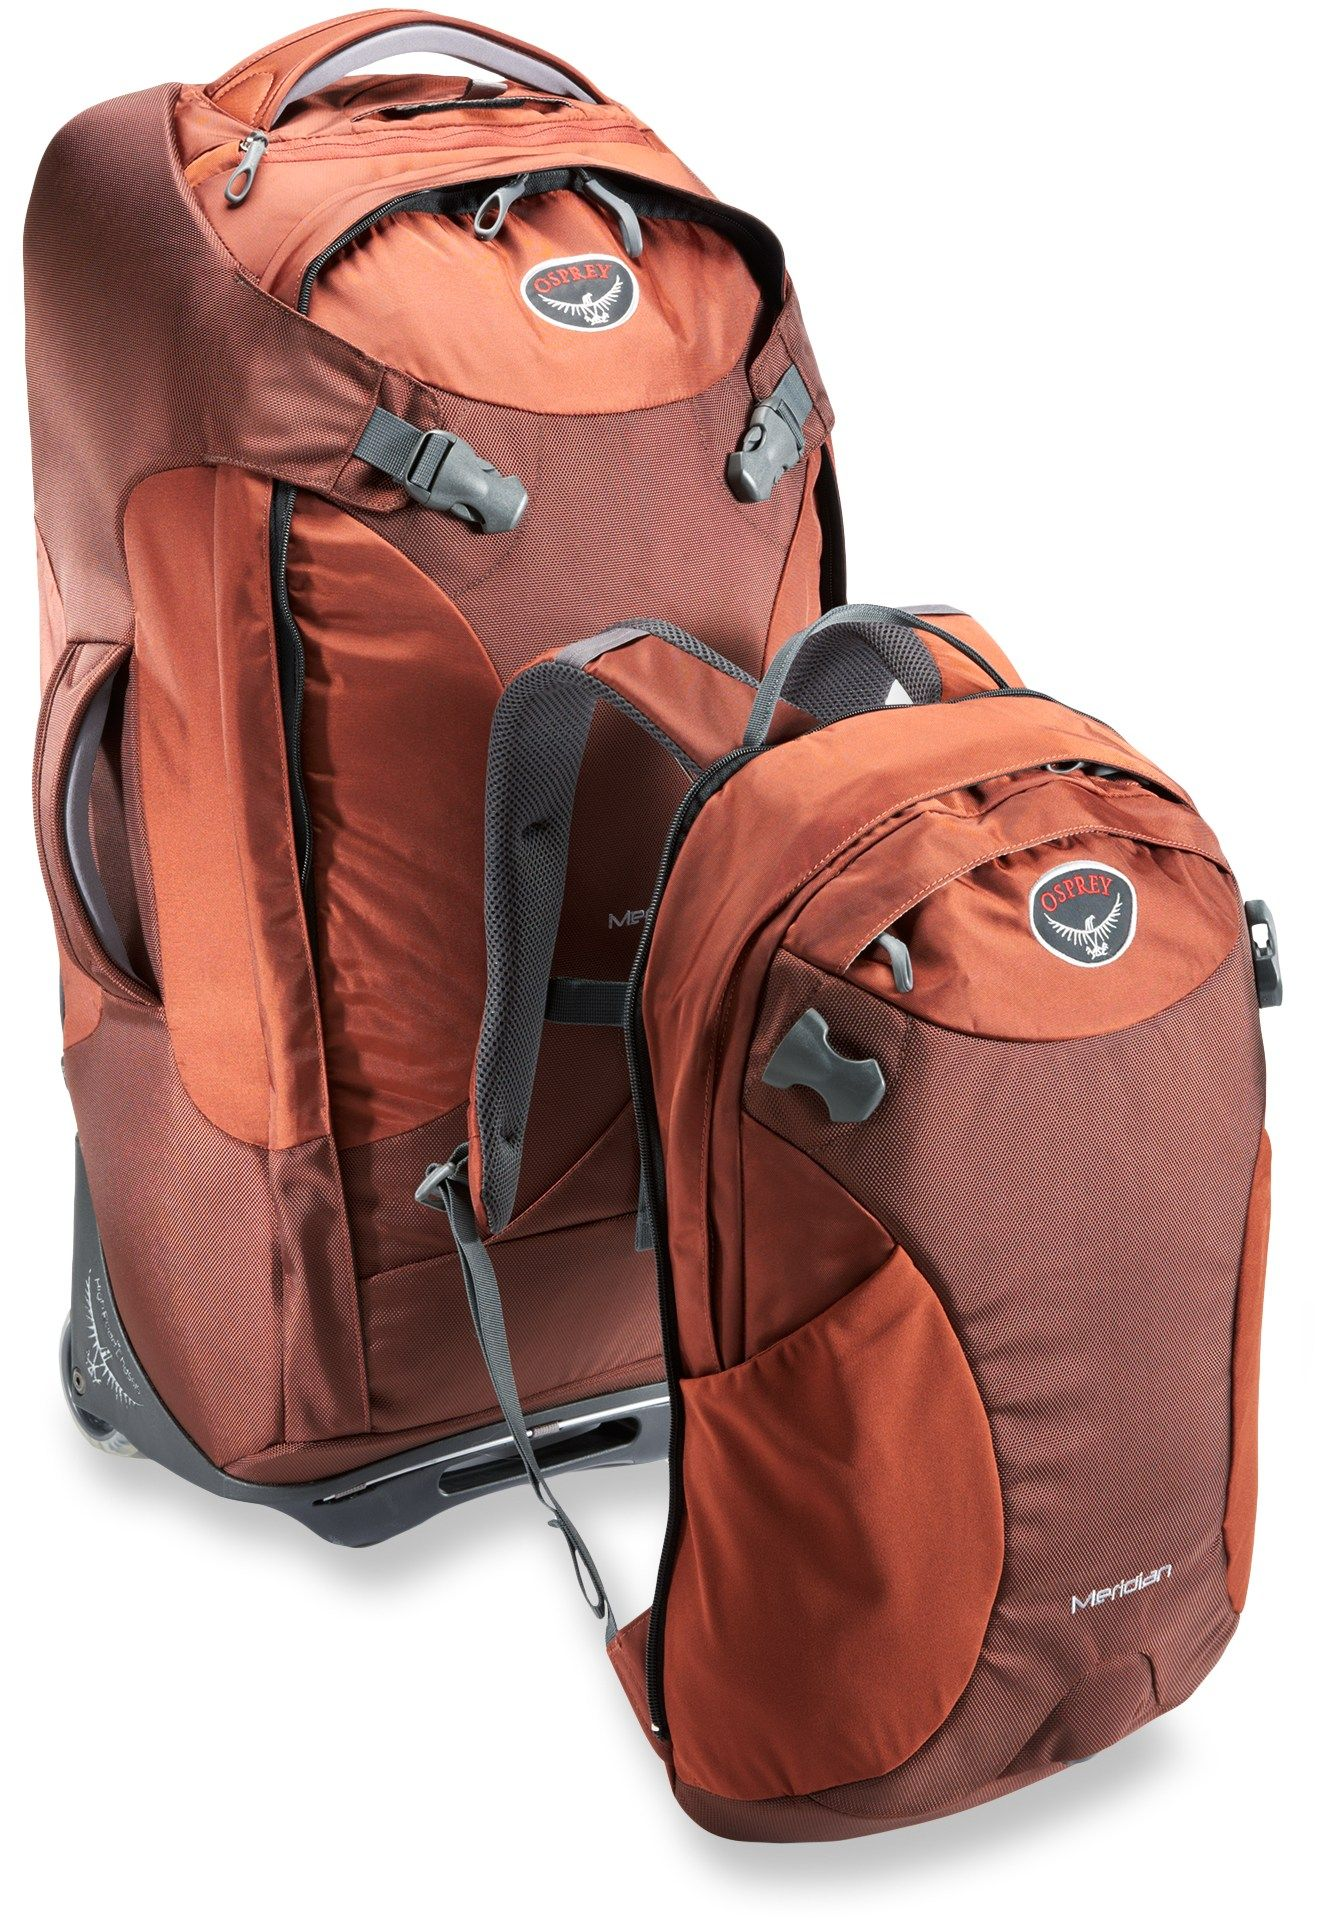 concurrerende prijs verkoop usa online verschillende stijlen Osprey Meridian Wheeled Convertible Luggage - 28 | Northwest ...